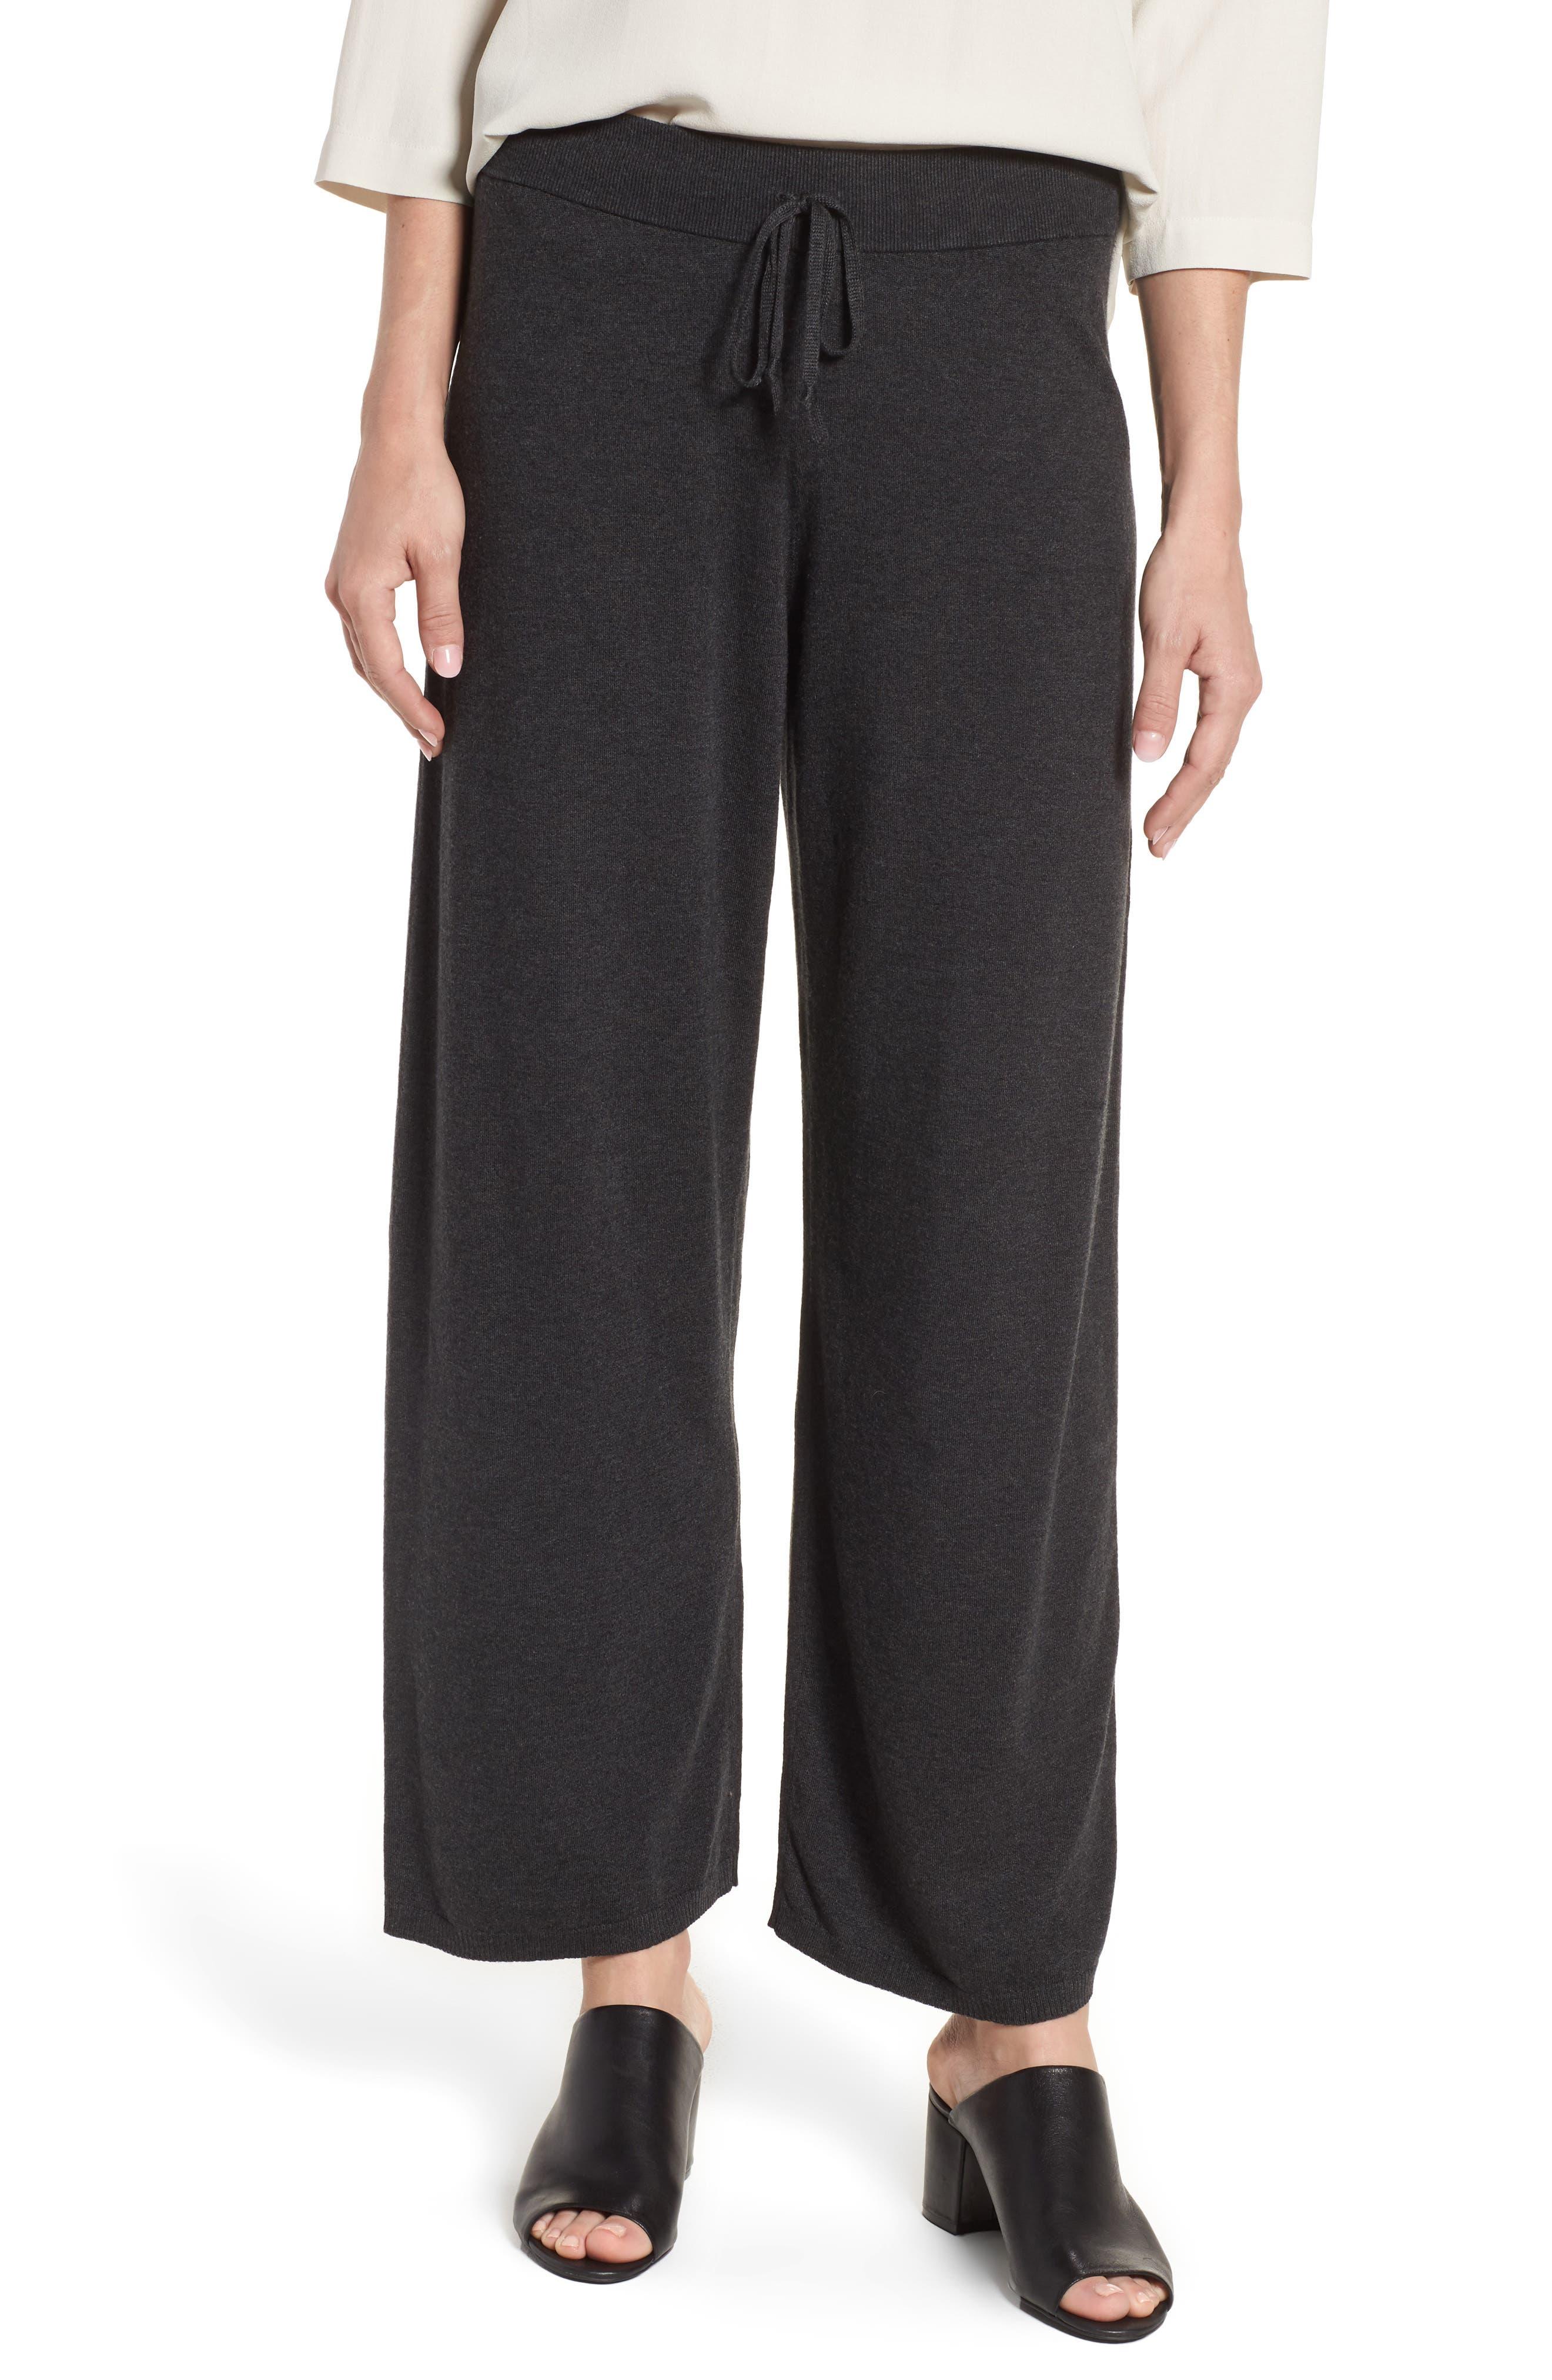 Tencel<sup>®</sup> Lyocell Blend Knit Wide Leg Pants,                         Main,                         color, Charcoal